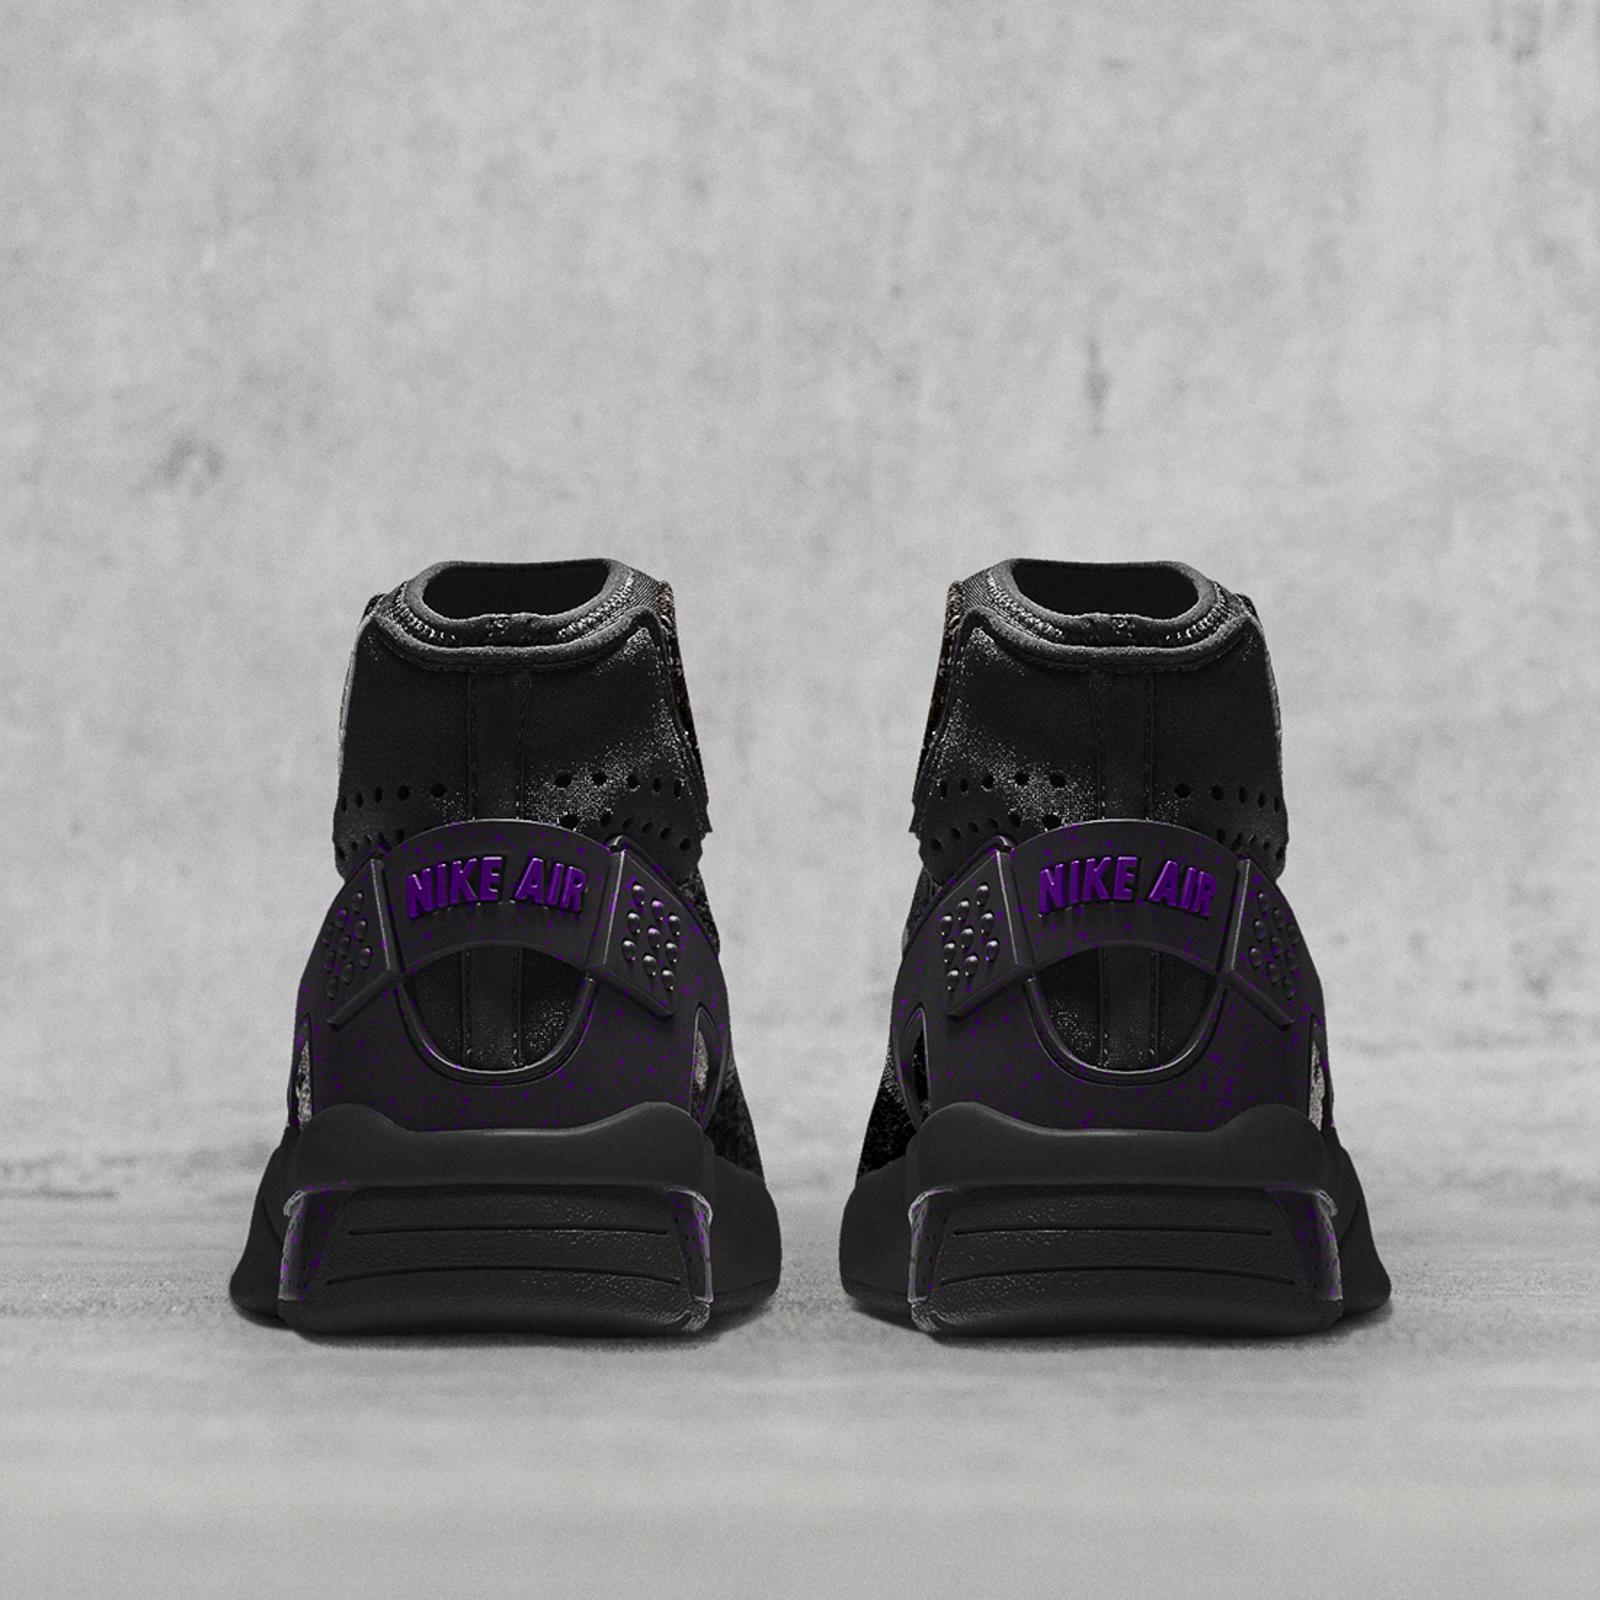 c54fad6faa98 Jay Gordon s Pendleton x Nike Mowabb is Future Americana - Nike News